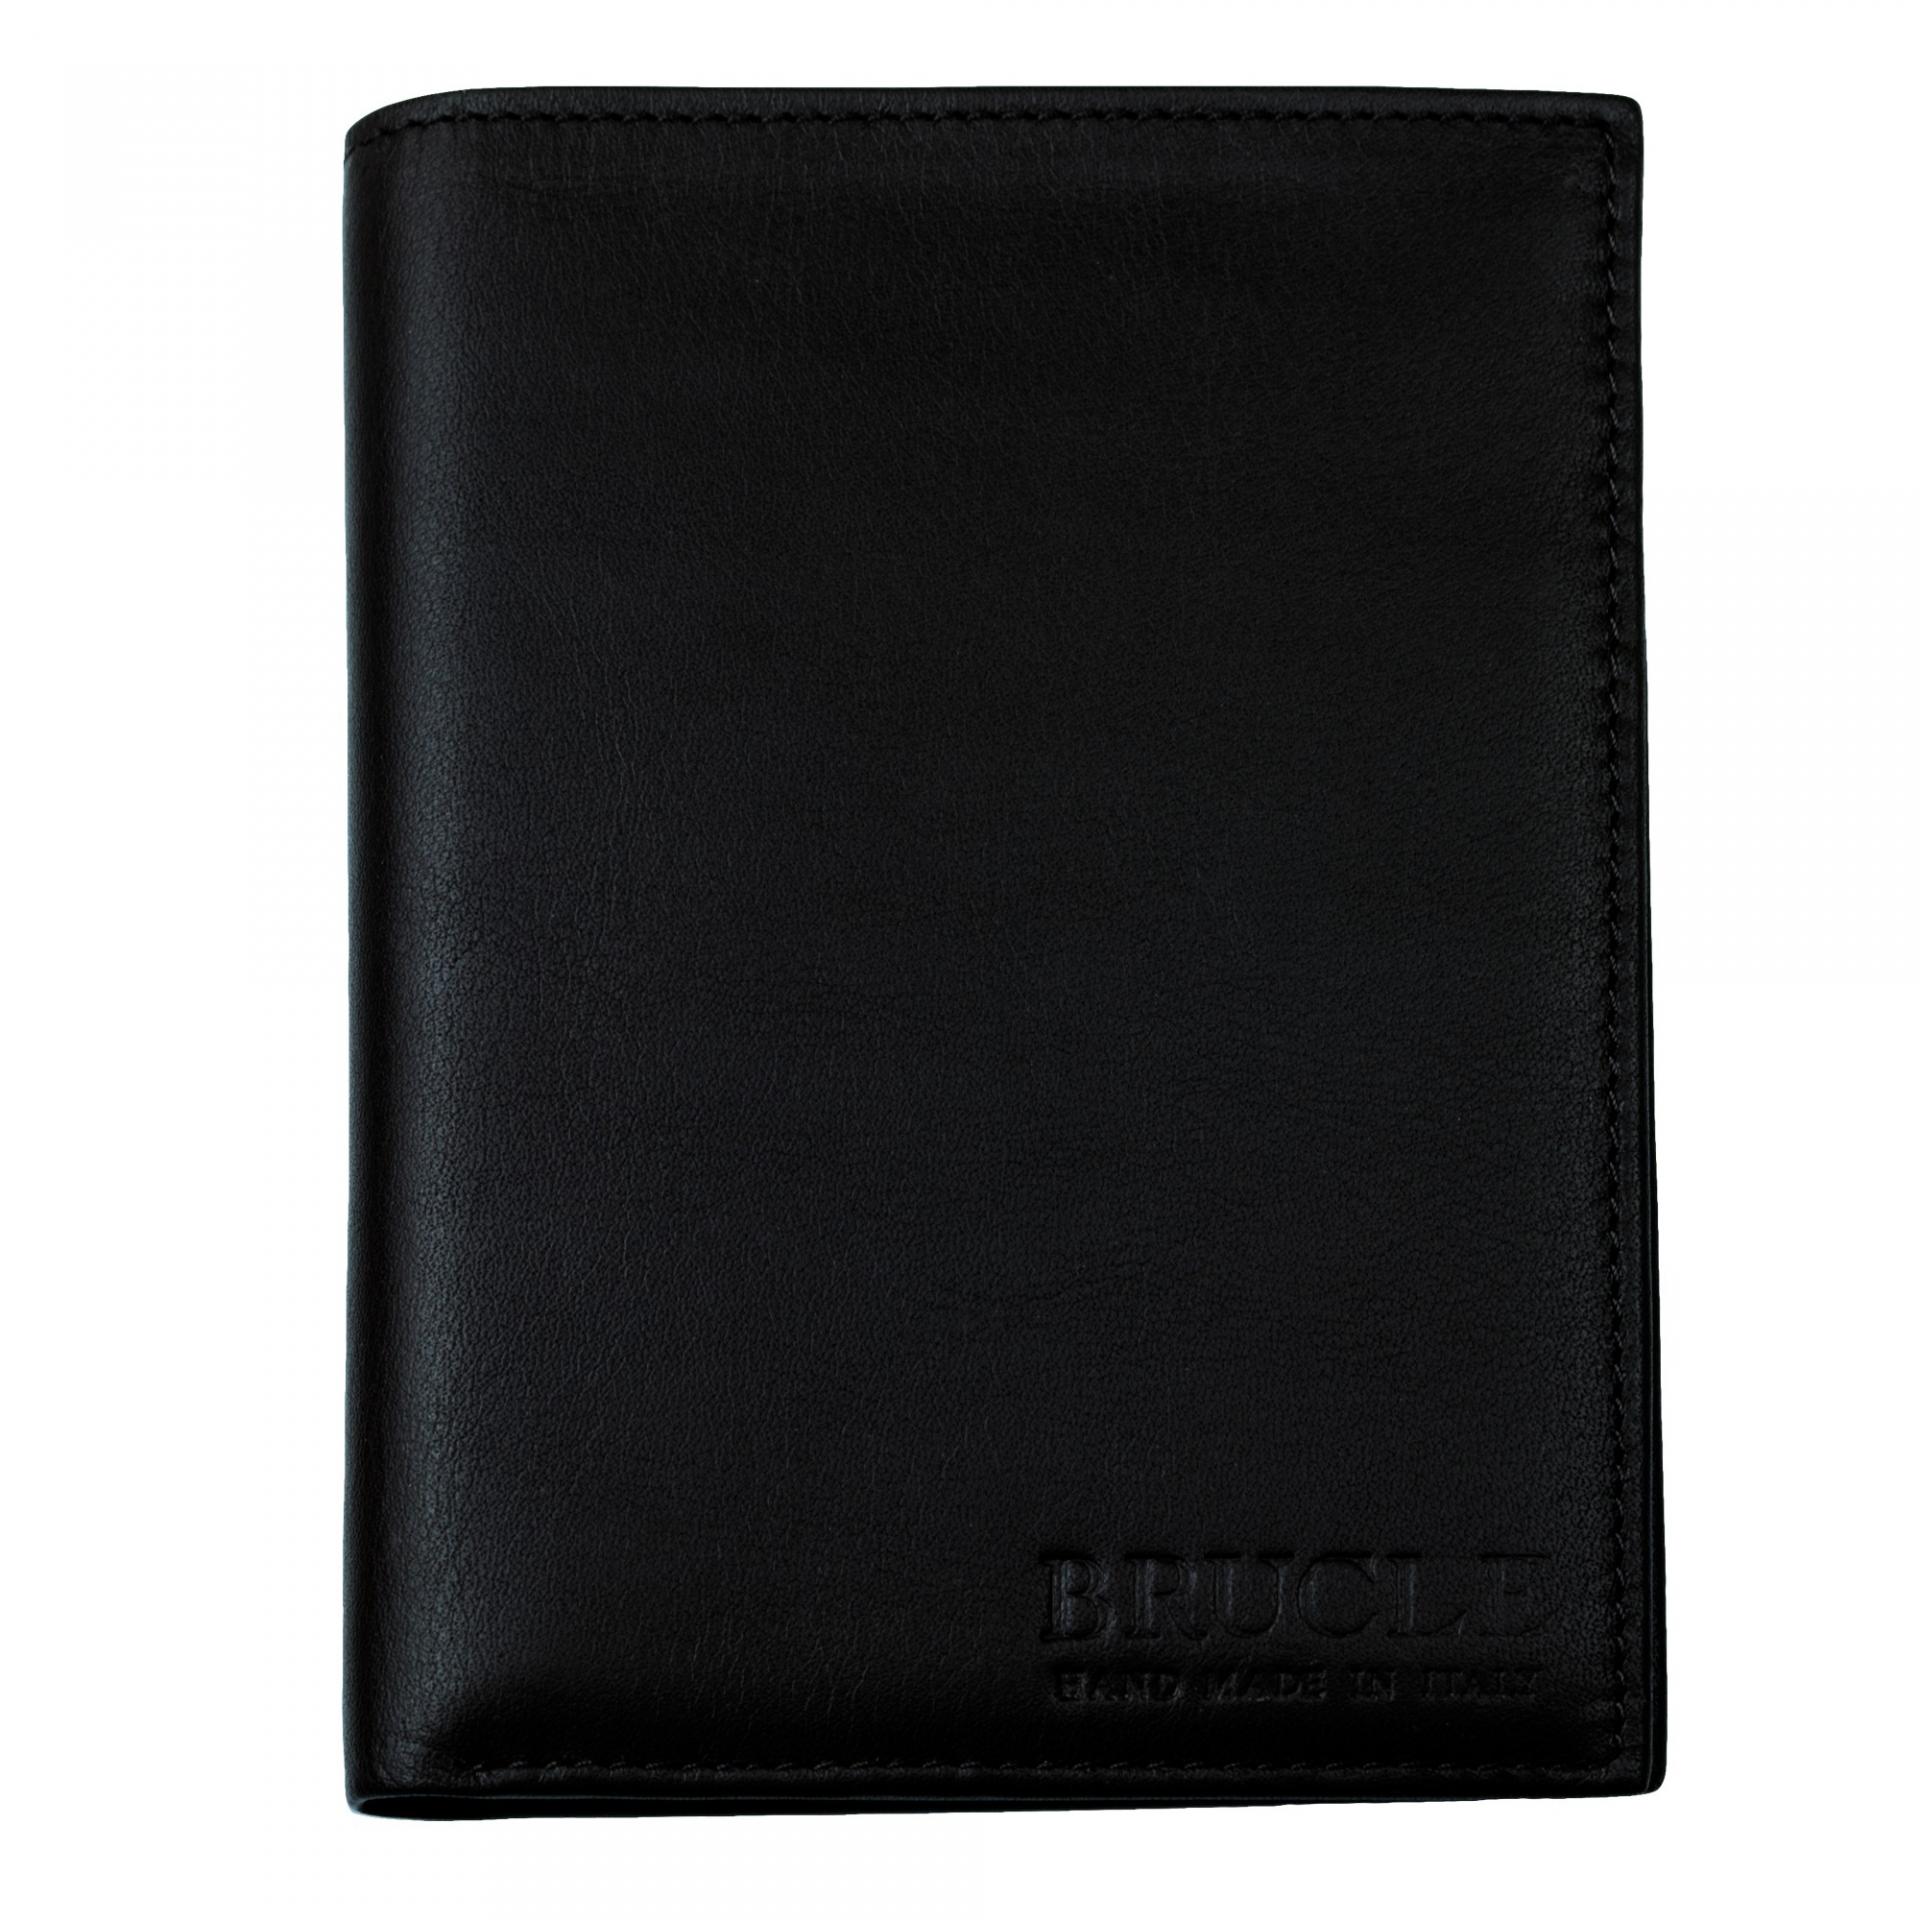 Unisex black Wallet